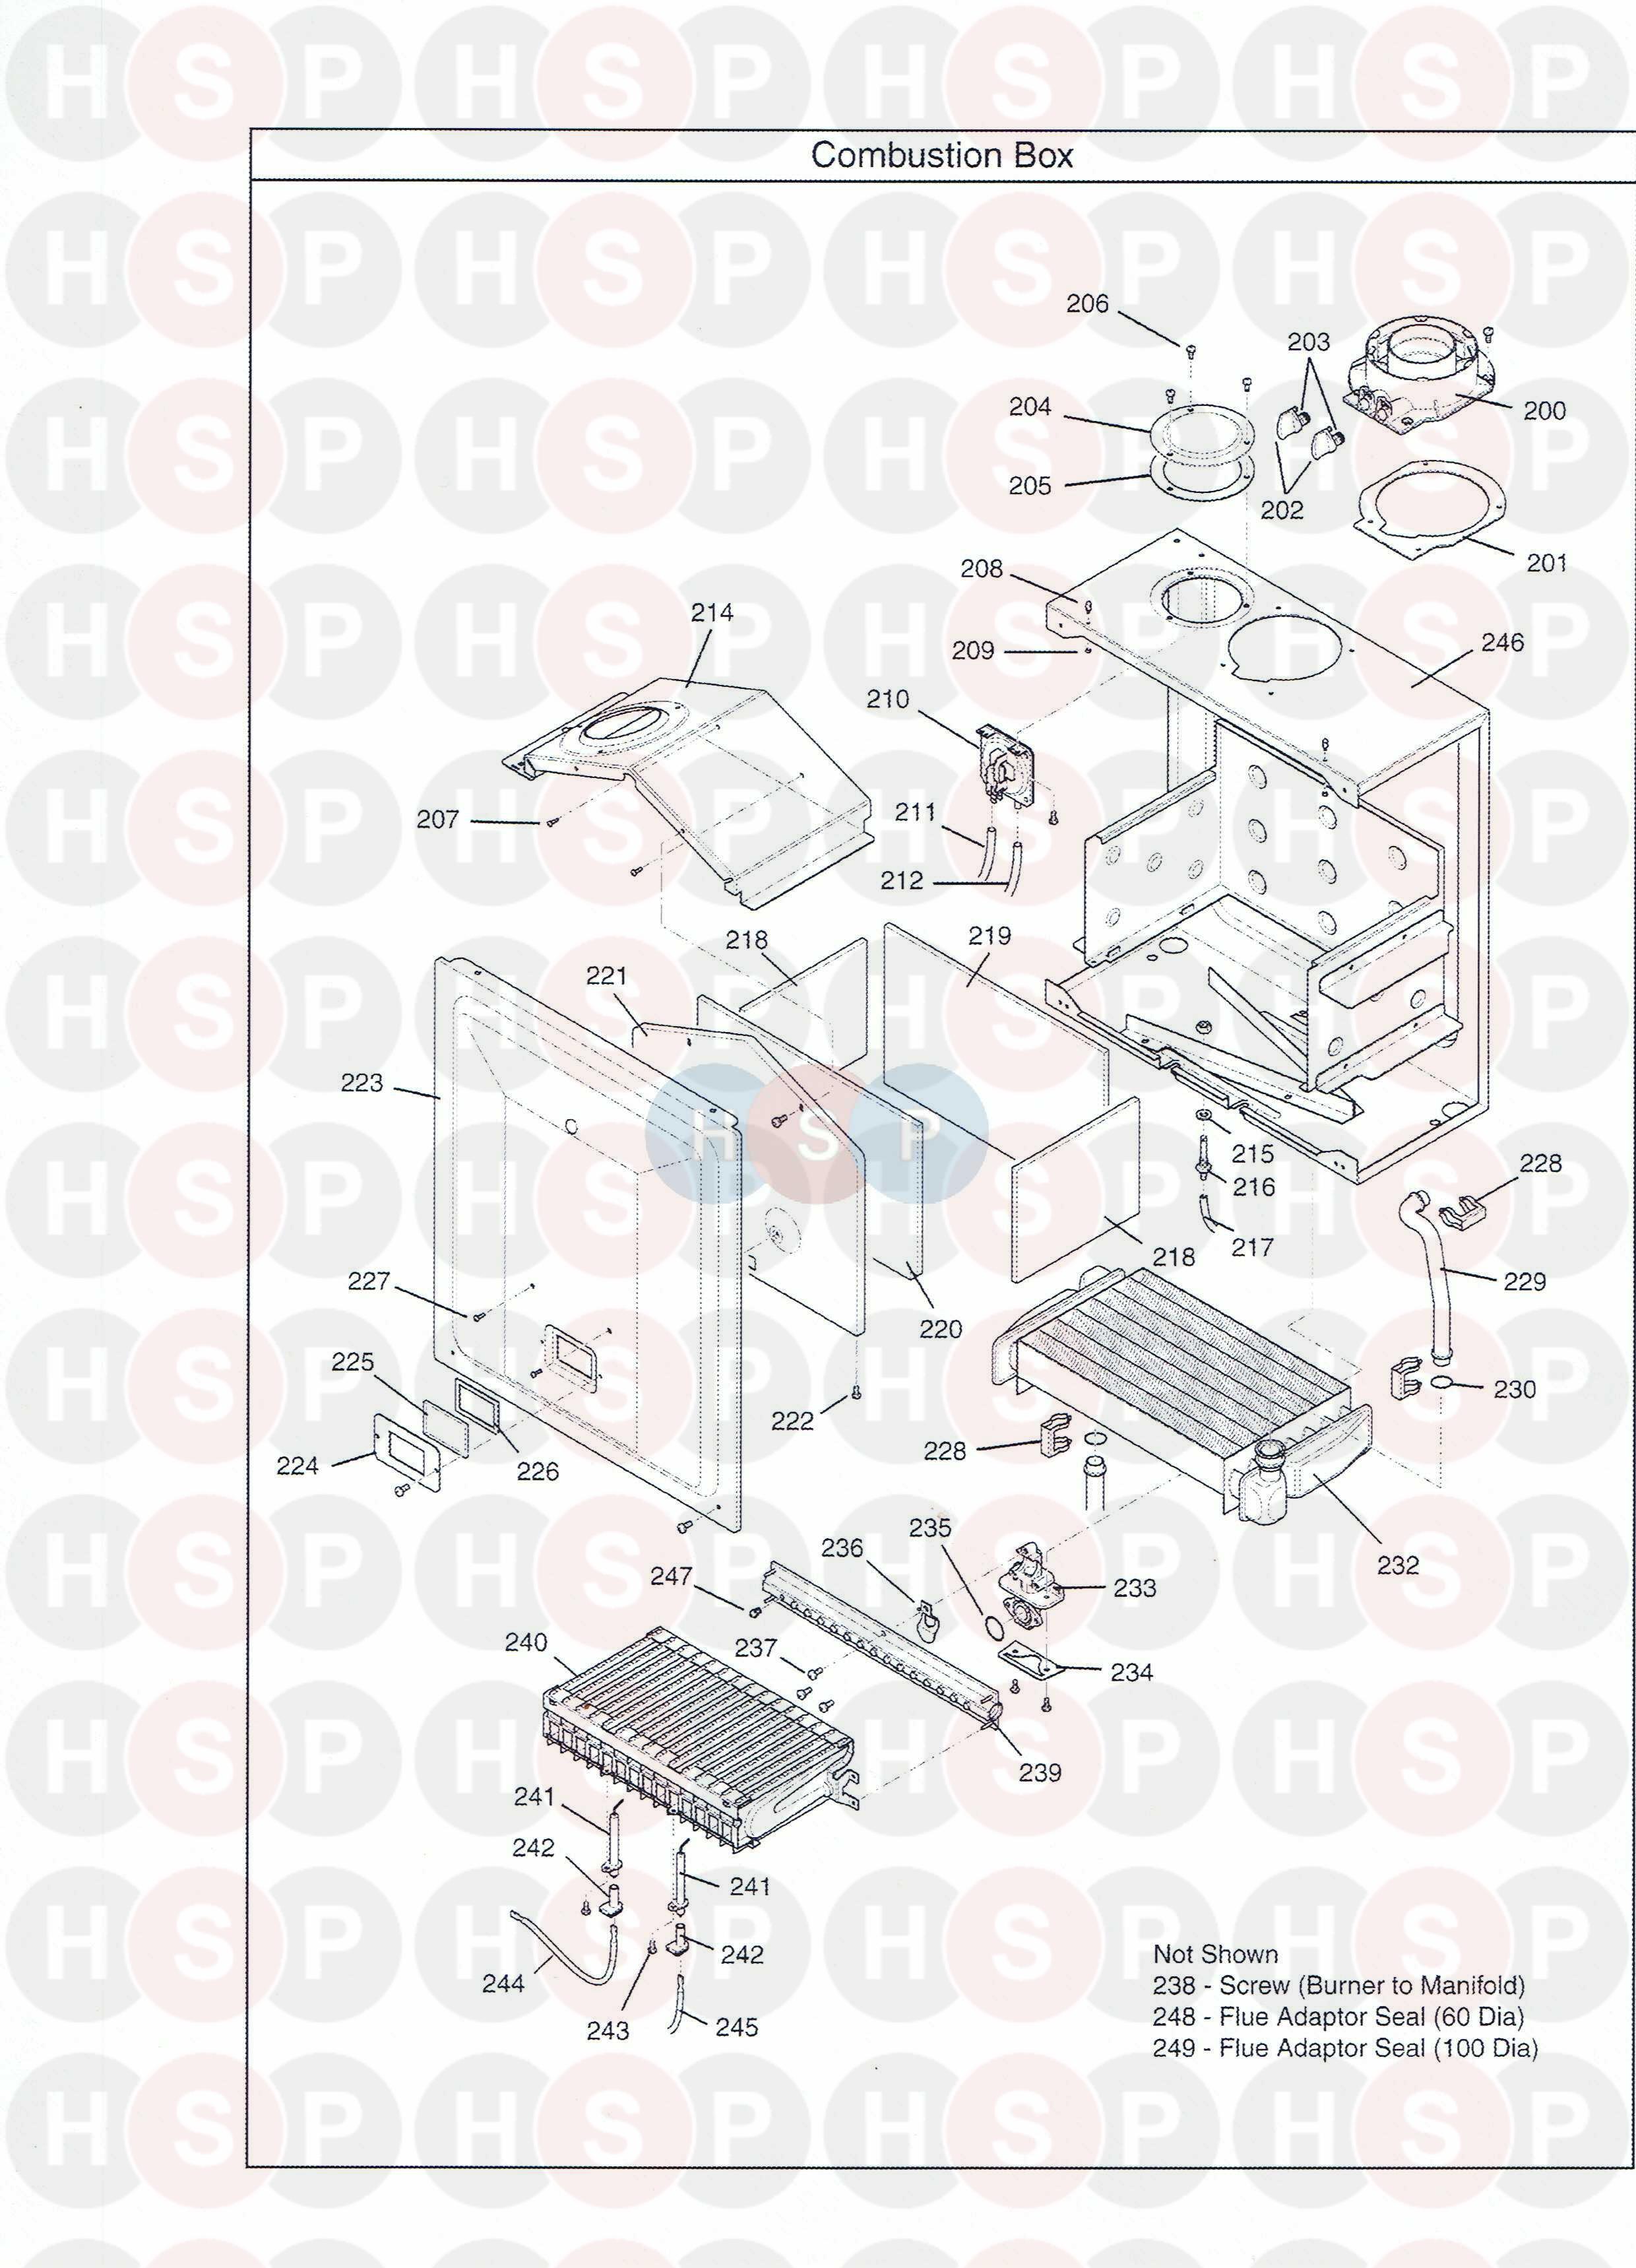 Potterton PERFORMA SYSTEM 18e Appliance Diagram